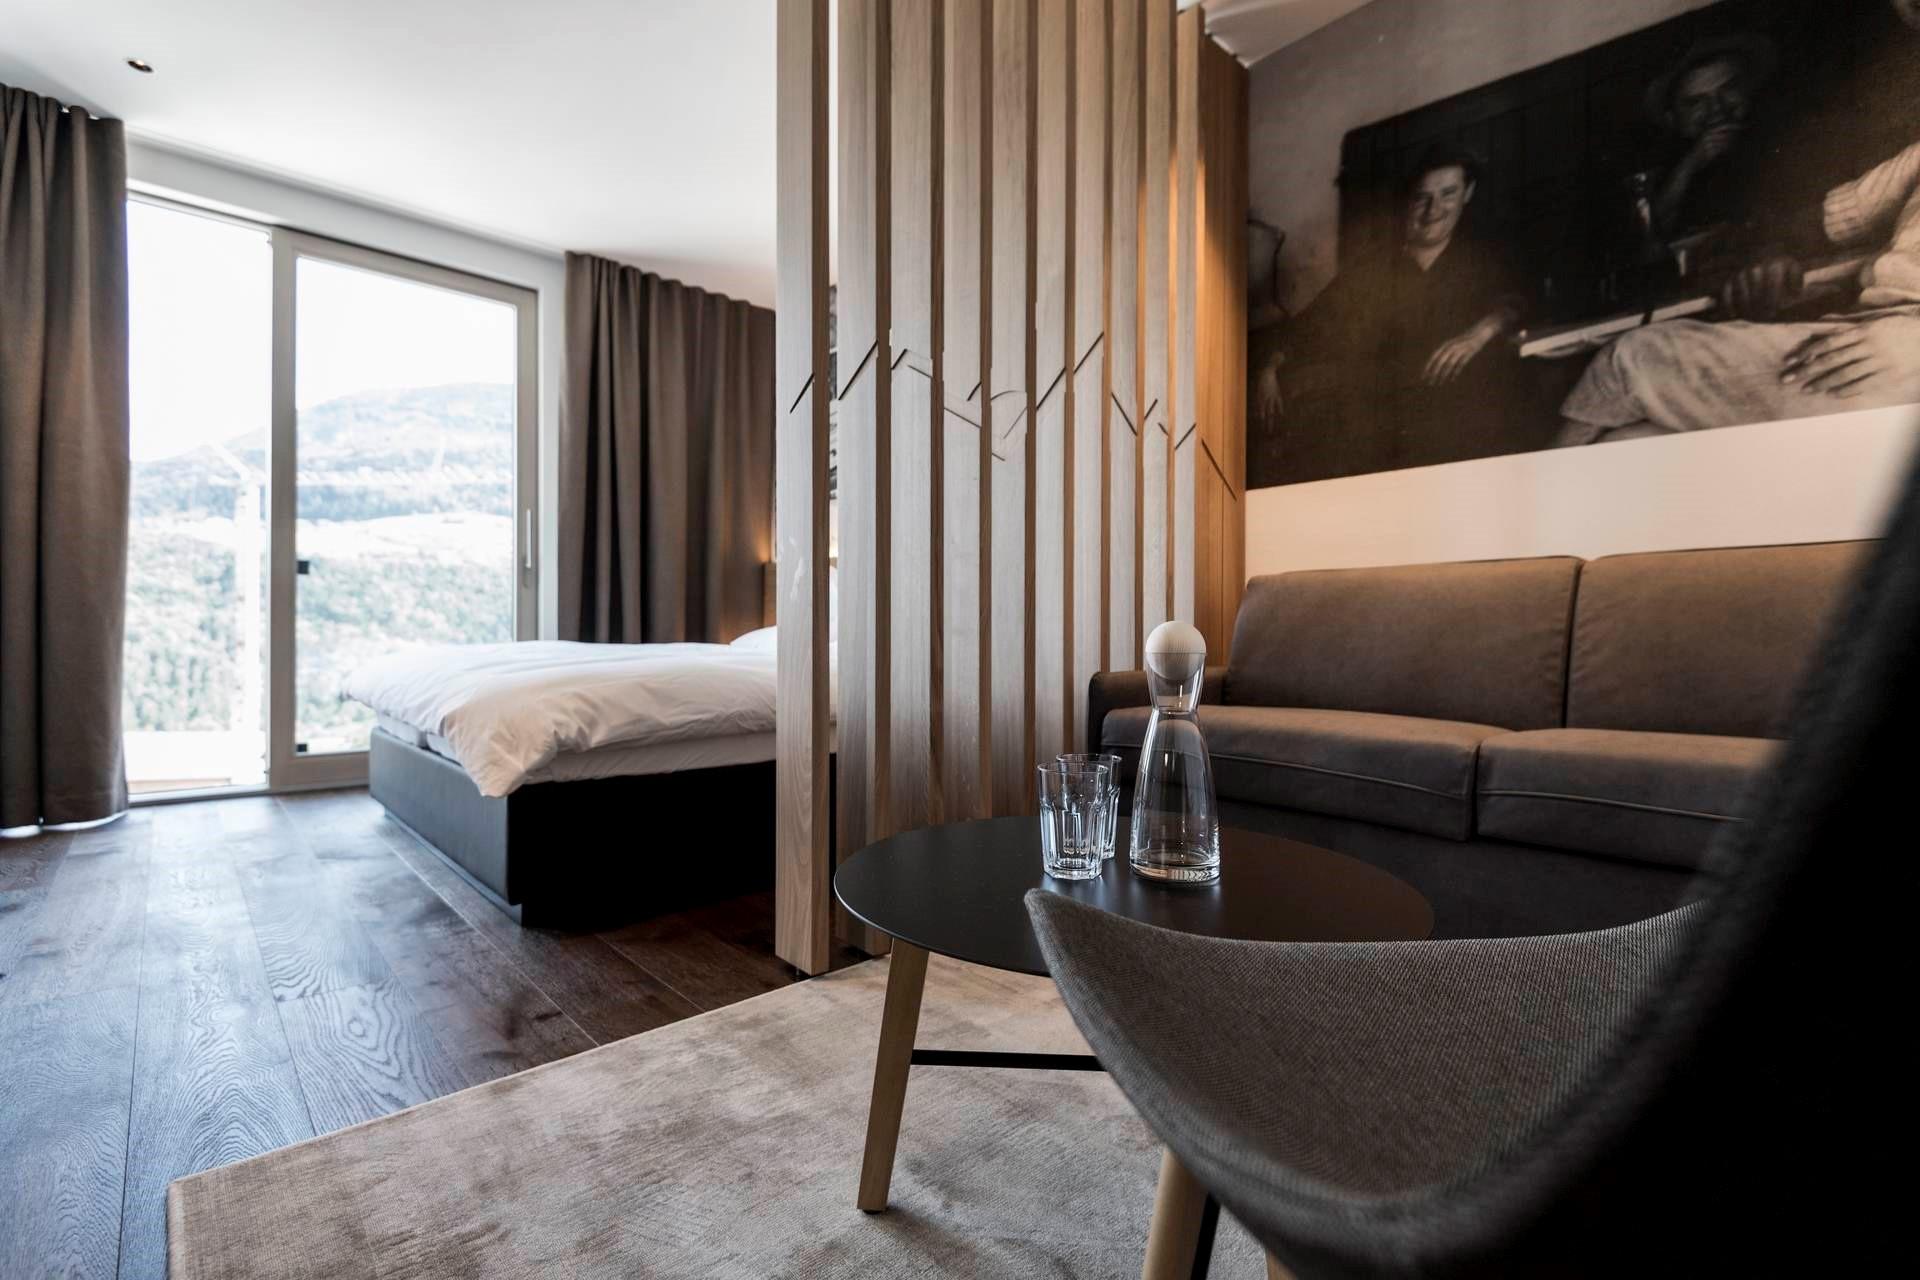 Alpin stylehotel die sonne superior design hotel in for Design hotel alto adige